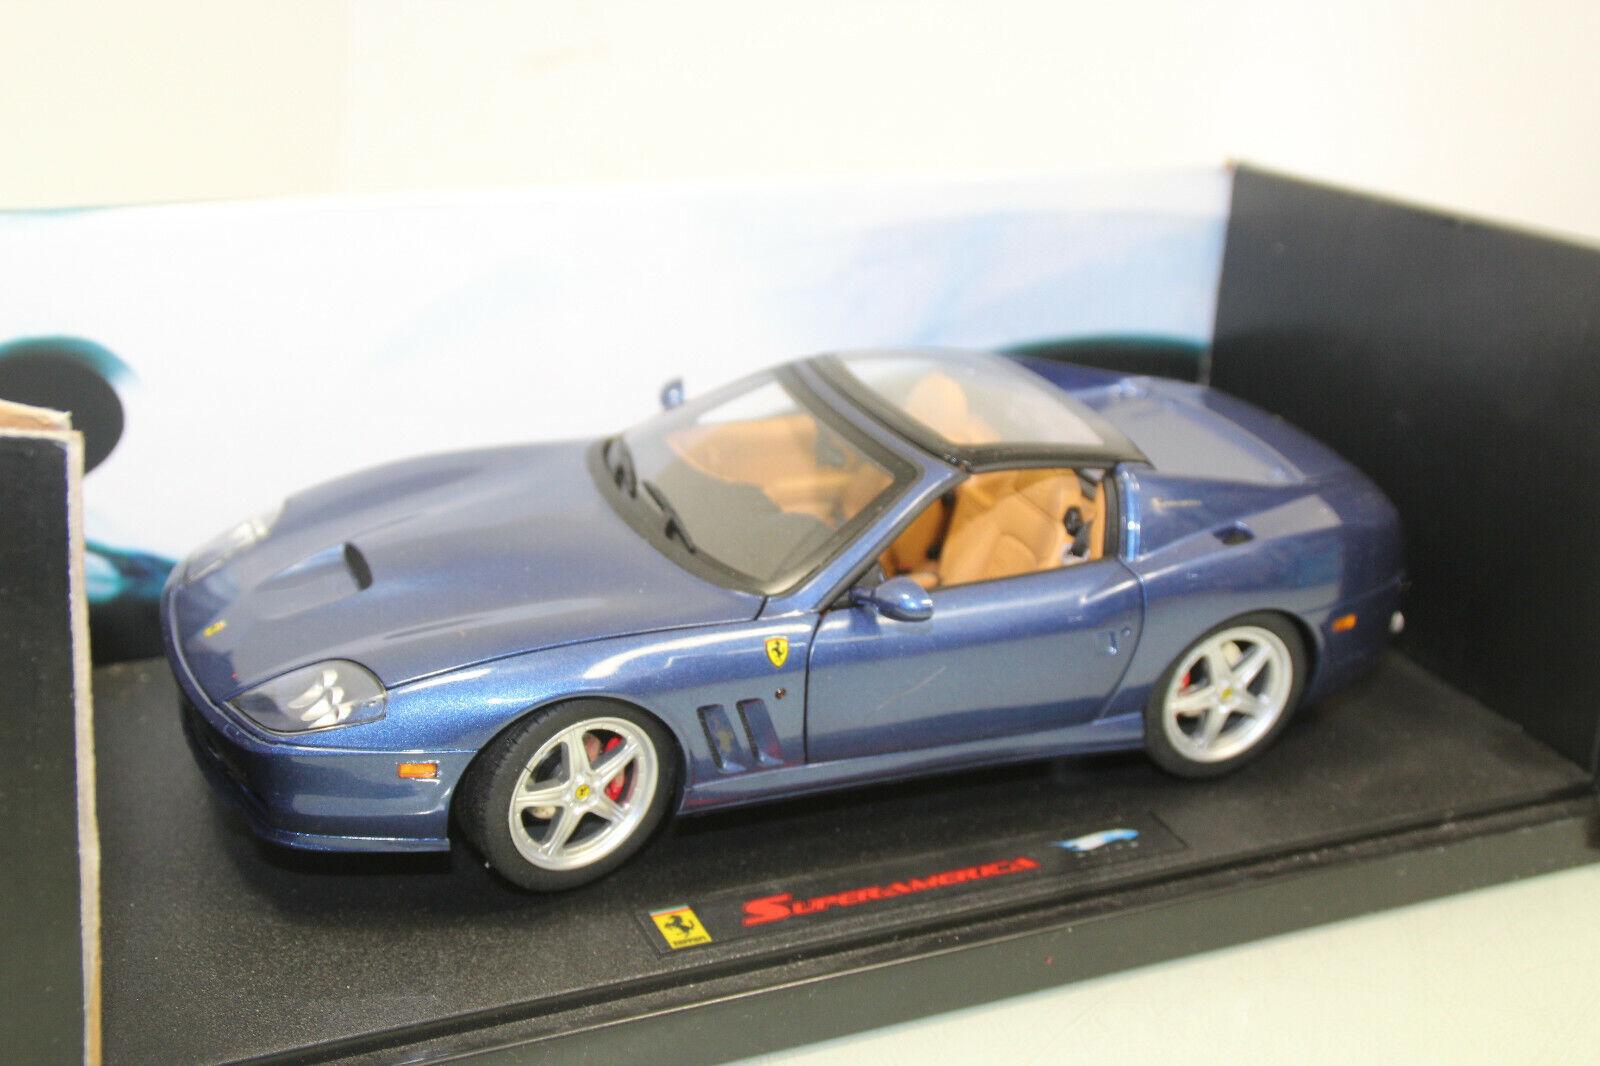 Mattell Hot Wheels Elite 1 18 j2922 Ferrari Superamerica bleu neuf dans sa boîte (js5305)